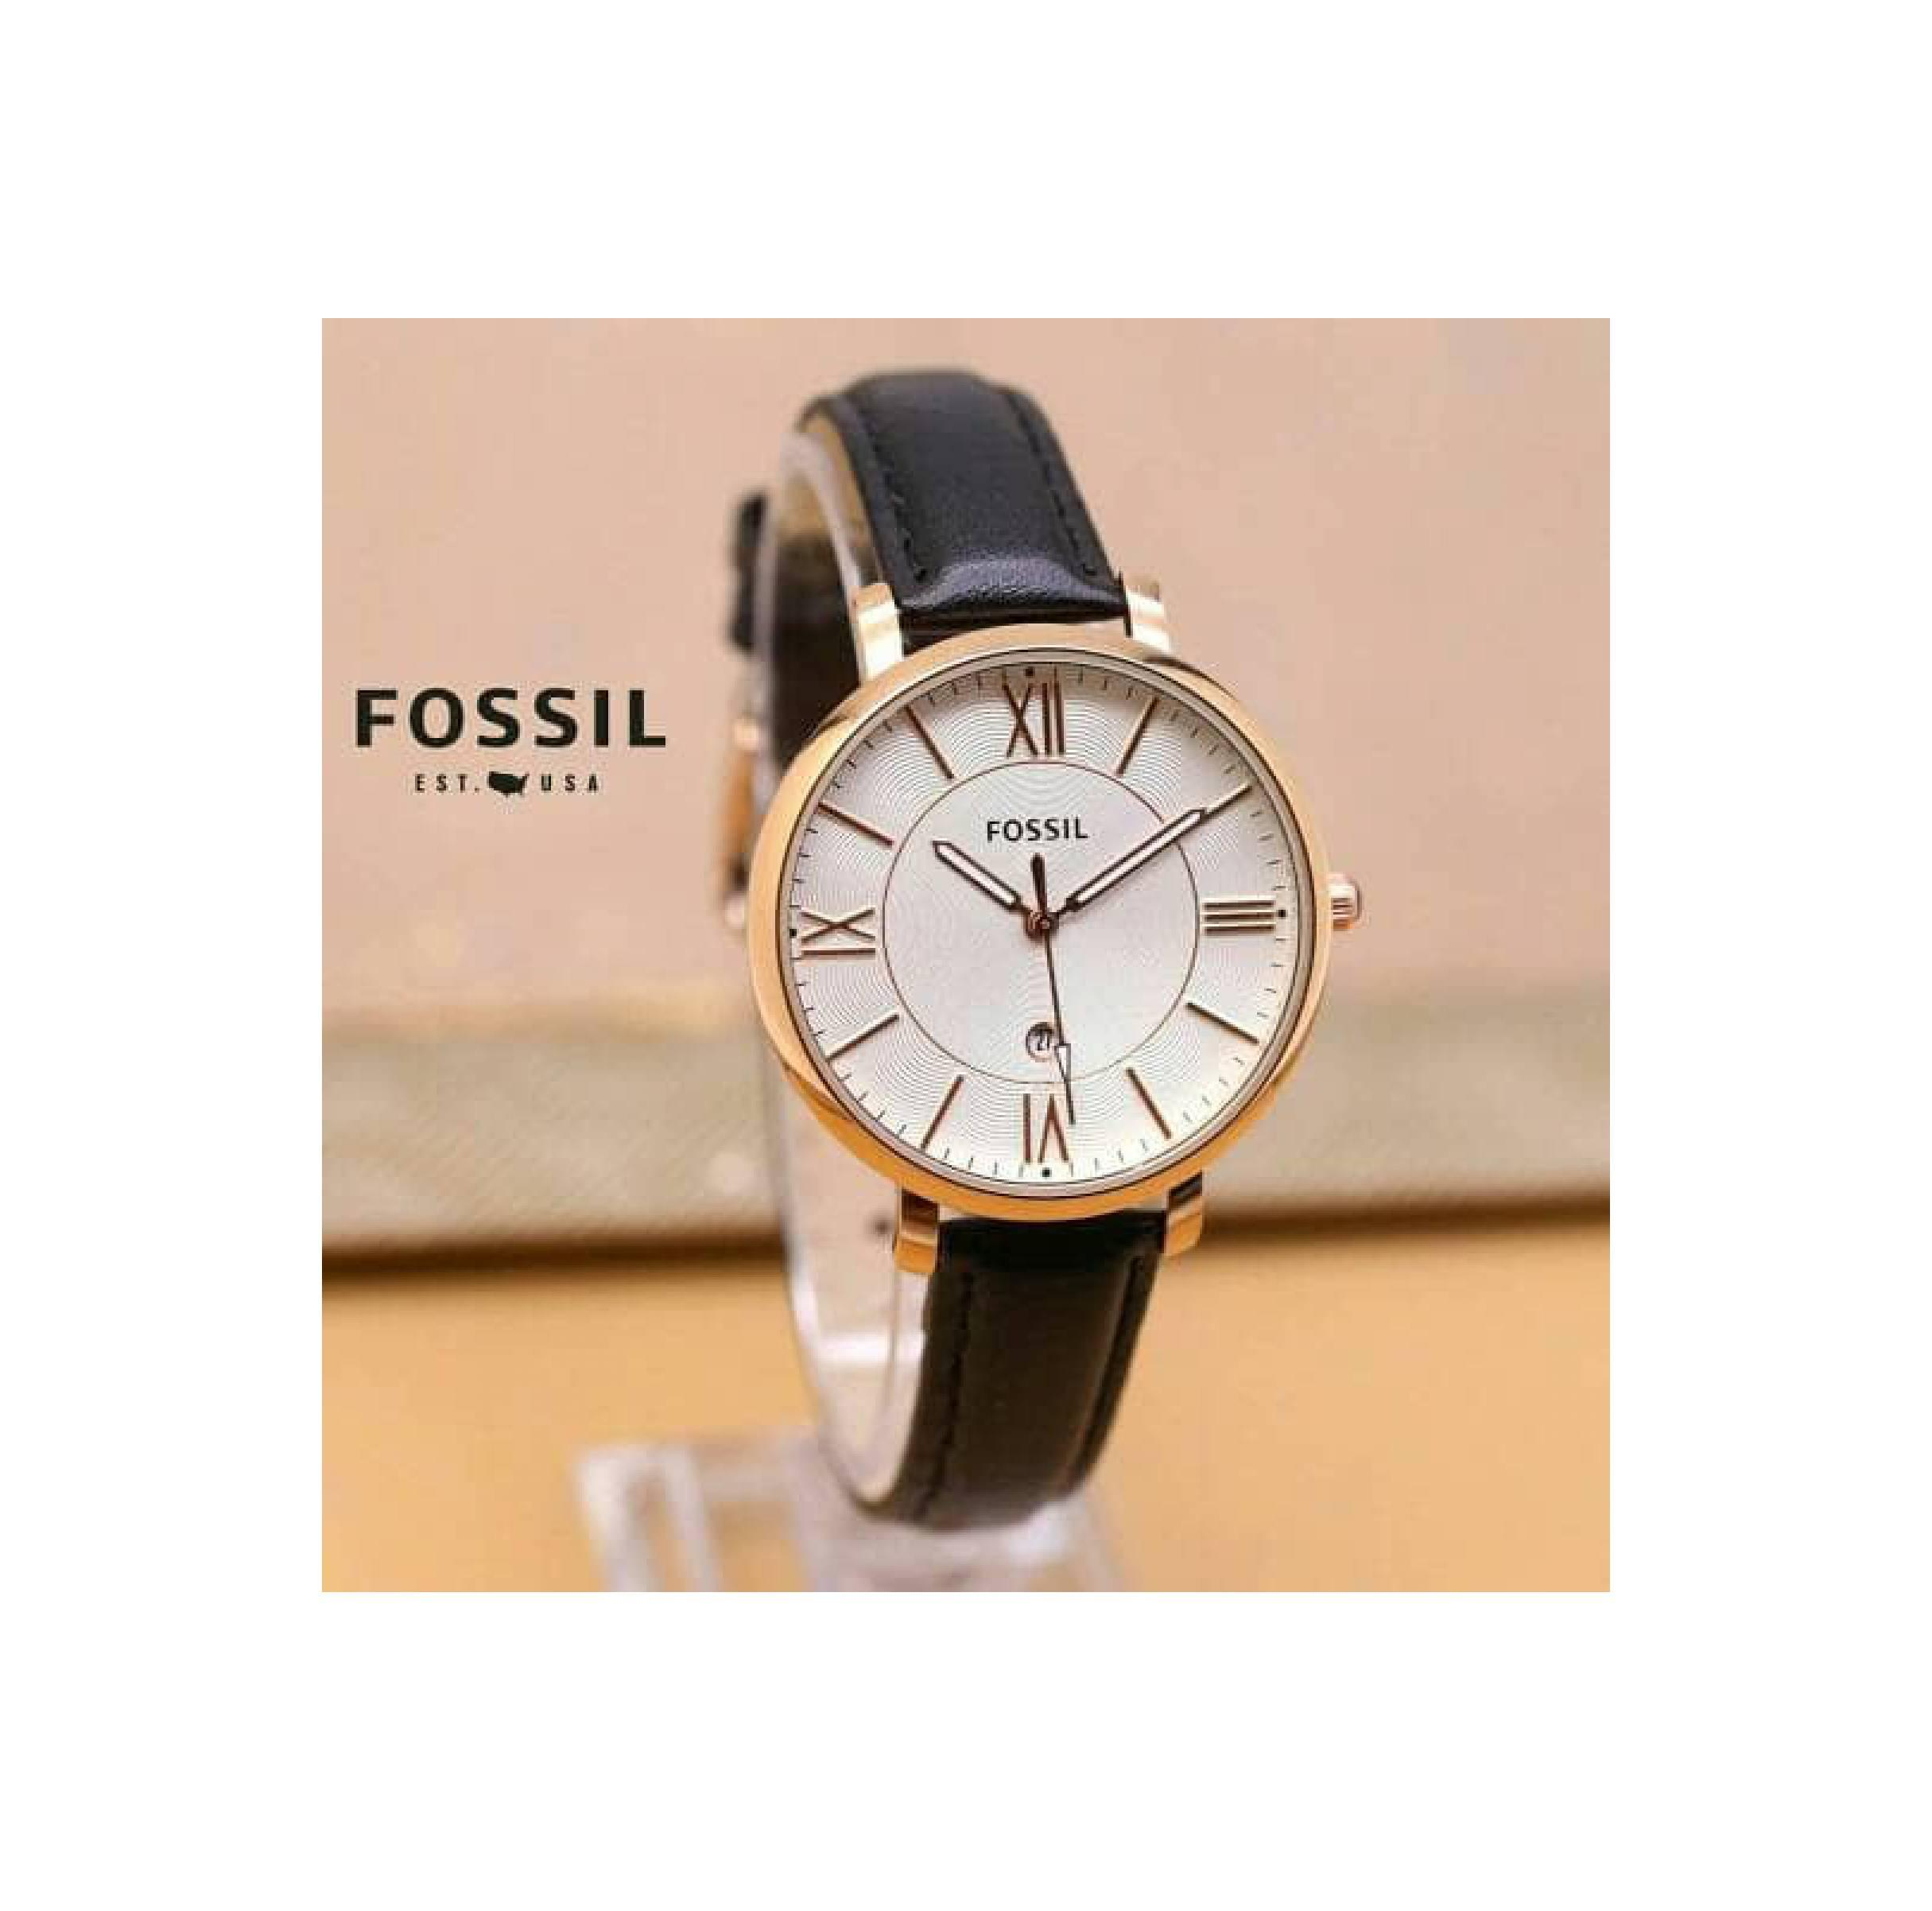 Fossil Es3487 Jacqueline Jam Tangan Wanita Bahan Tali Leather Beige Original Es3988 Blush Cewek Stap Hitam